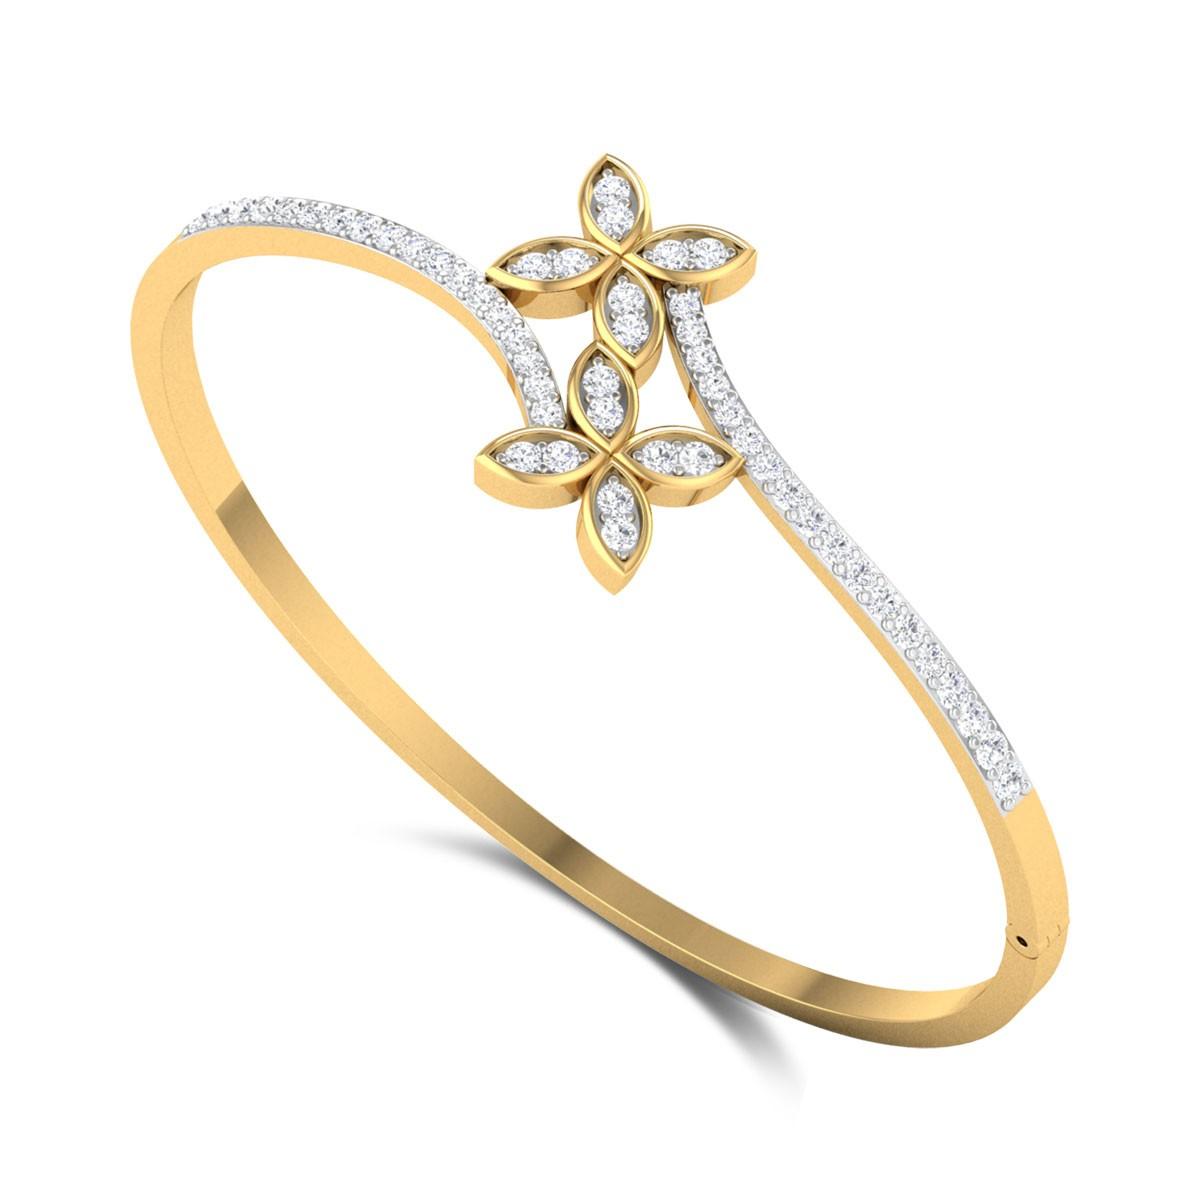 Dual Flower Wavy Openable Diamond Bangle